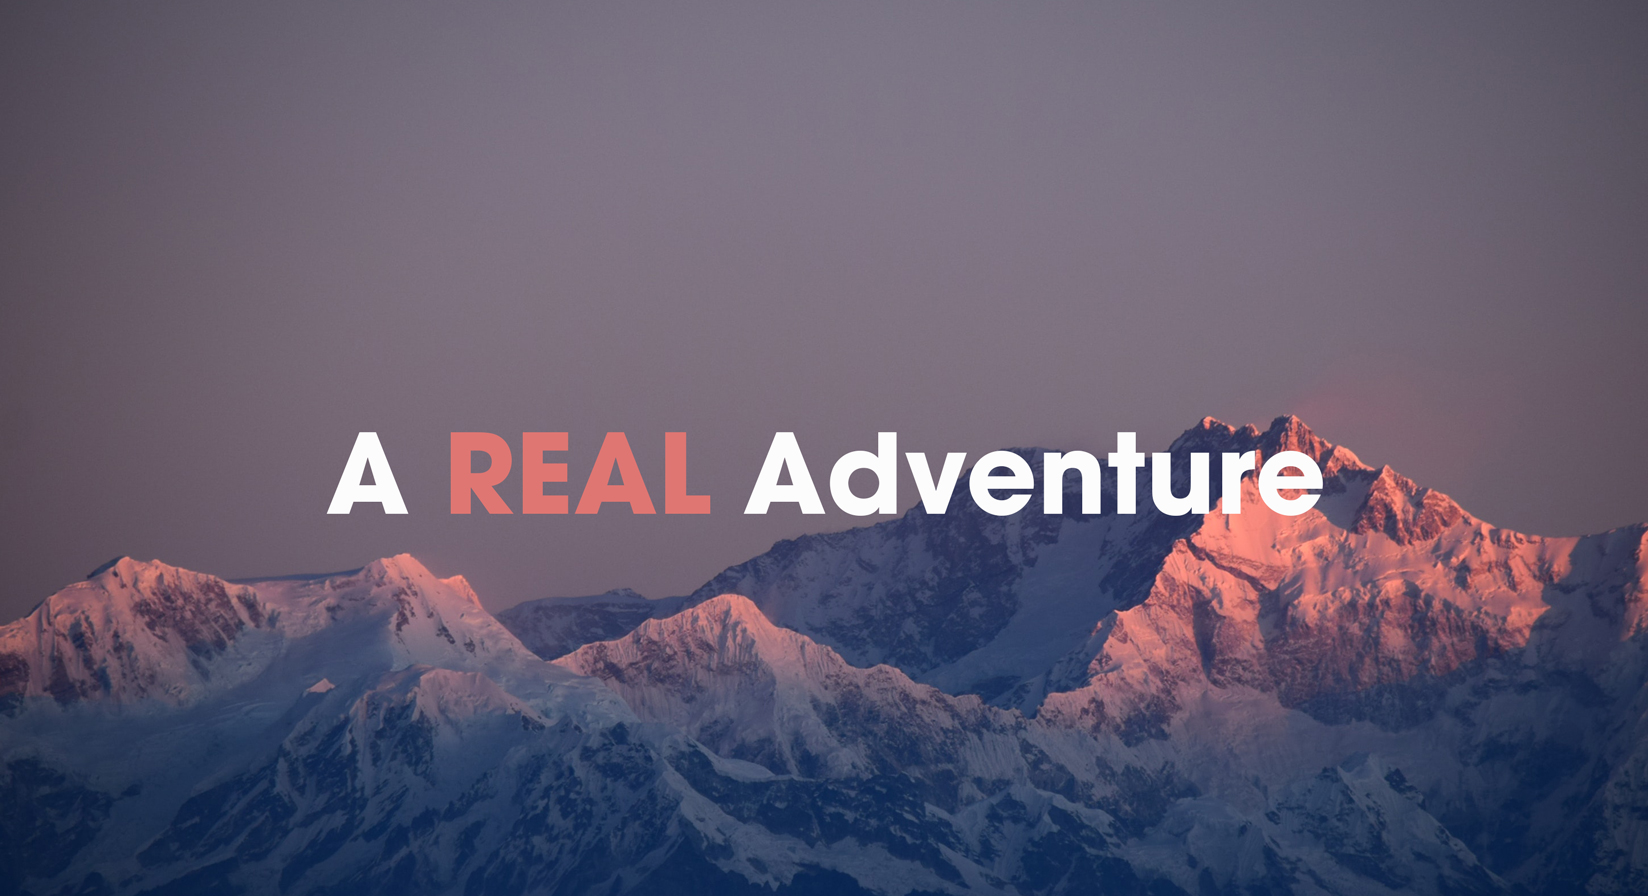 a real adventure.jpg